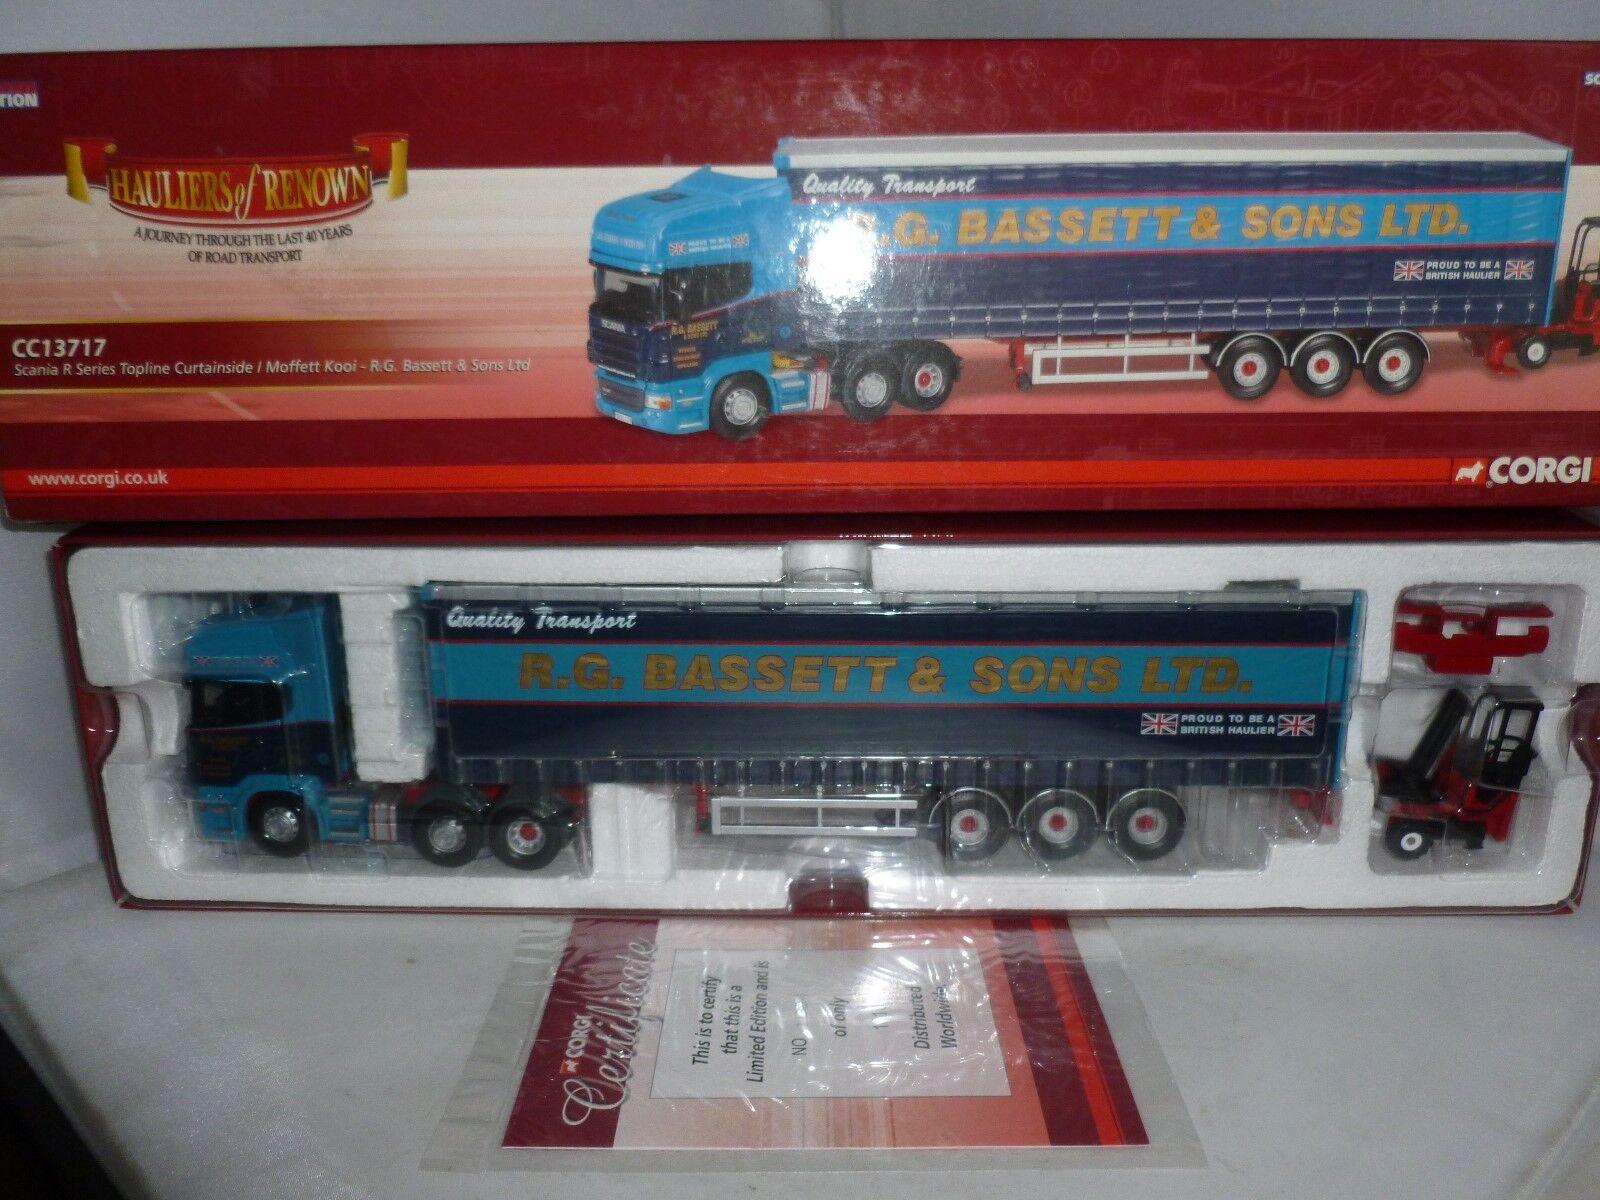 Corgi Diecast transportistas de renombre CC13717 Scania Serie R Topline Curtainside